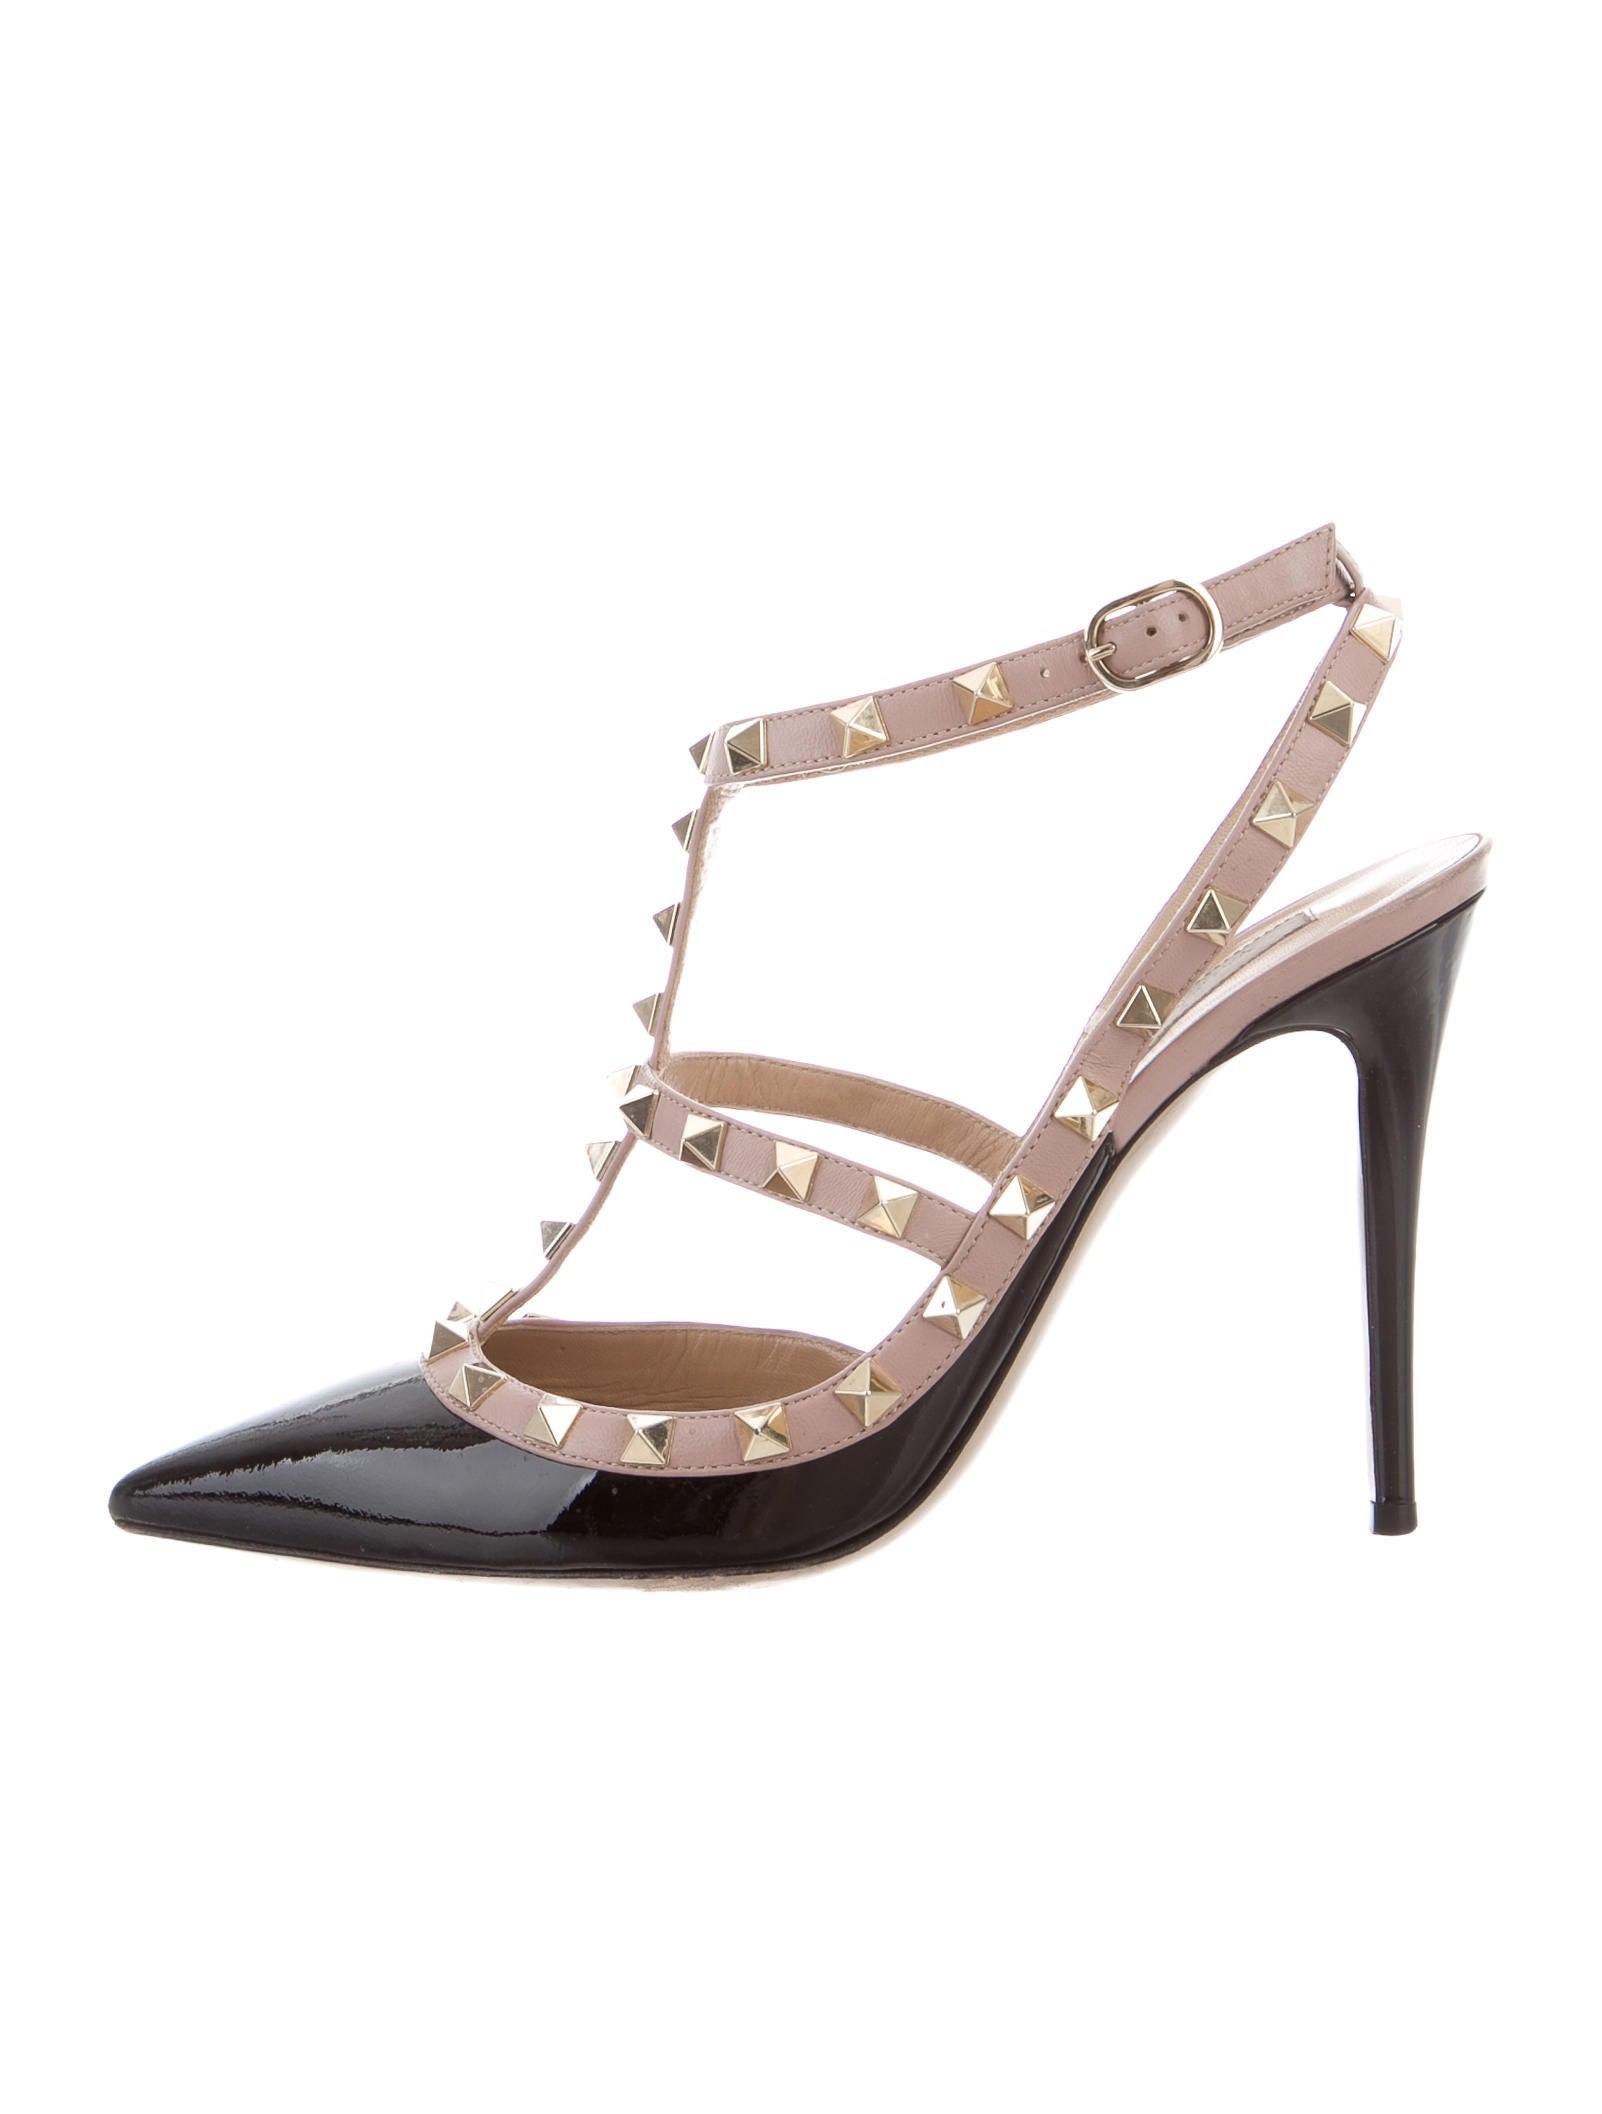 valentino rockstud pointed toe pumps shoes val64401. Black Bedroom Furniture Sets. Home Design Ideas